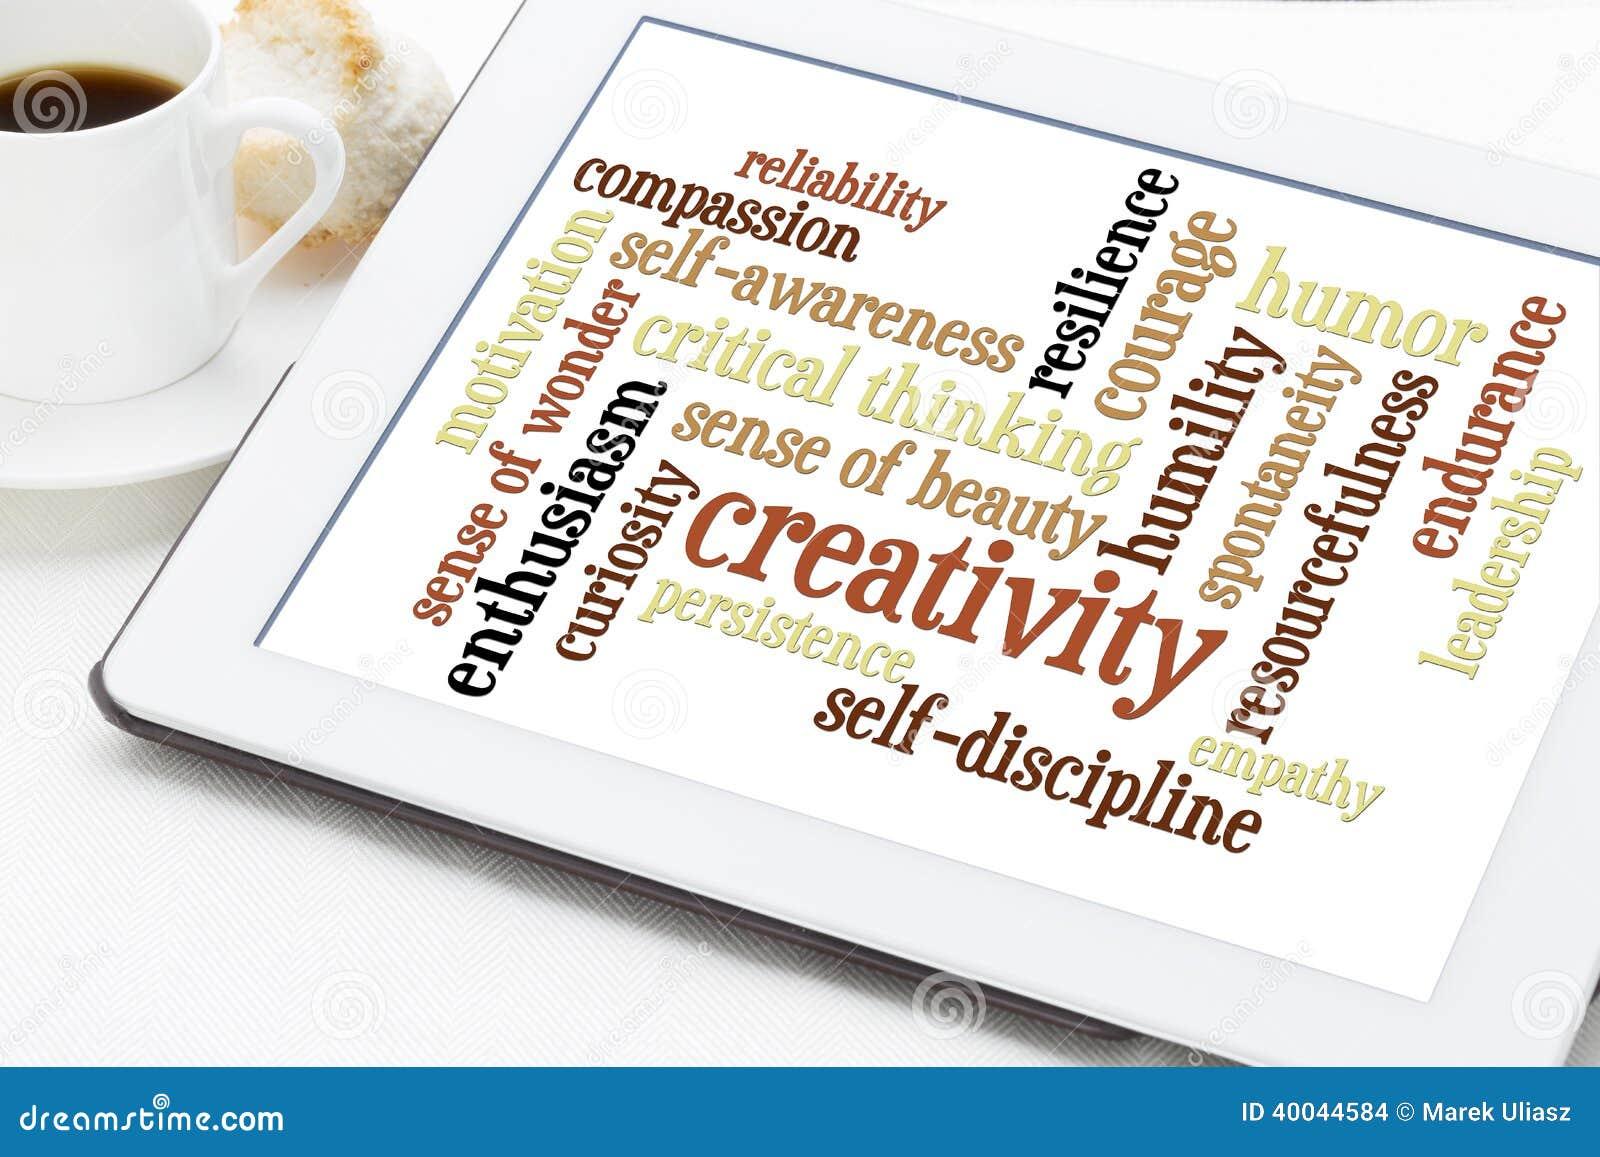 word cloud personal qualities het persoonlijke wolk self creativity discipline coffee digital parola nuvola trait key personligt tablet cup successful